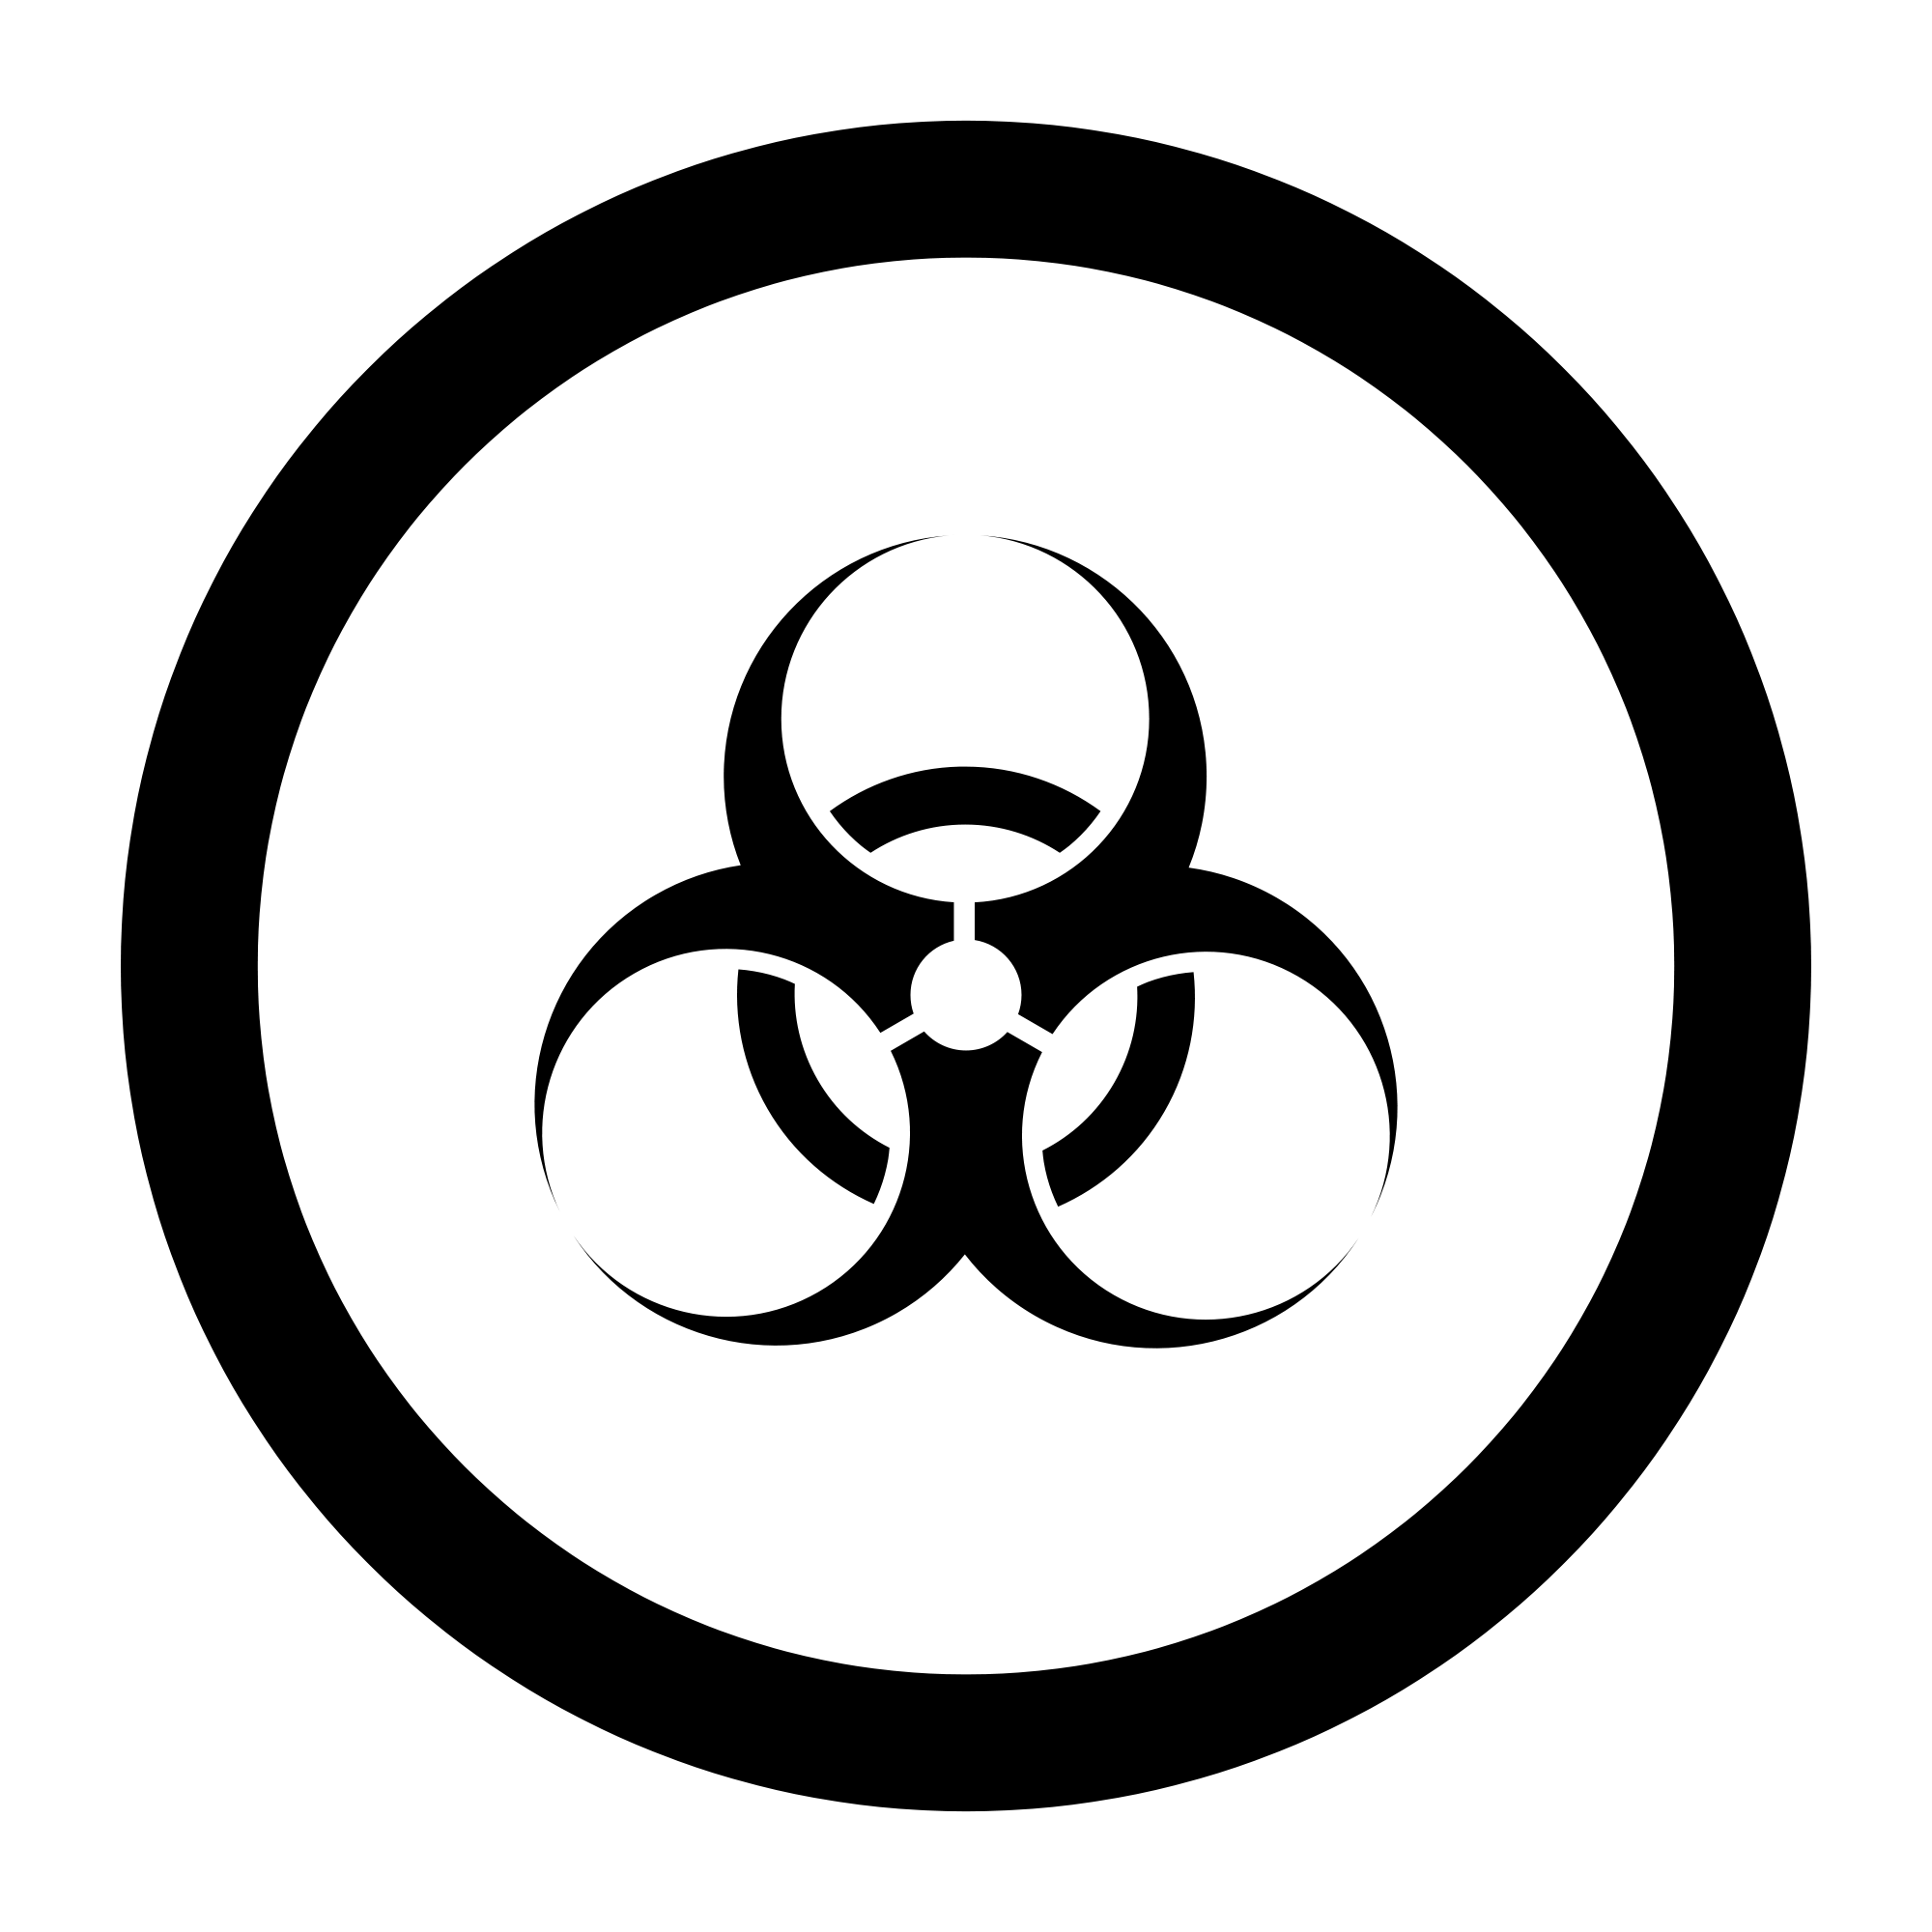 Hazmat Symbols